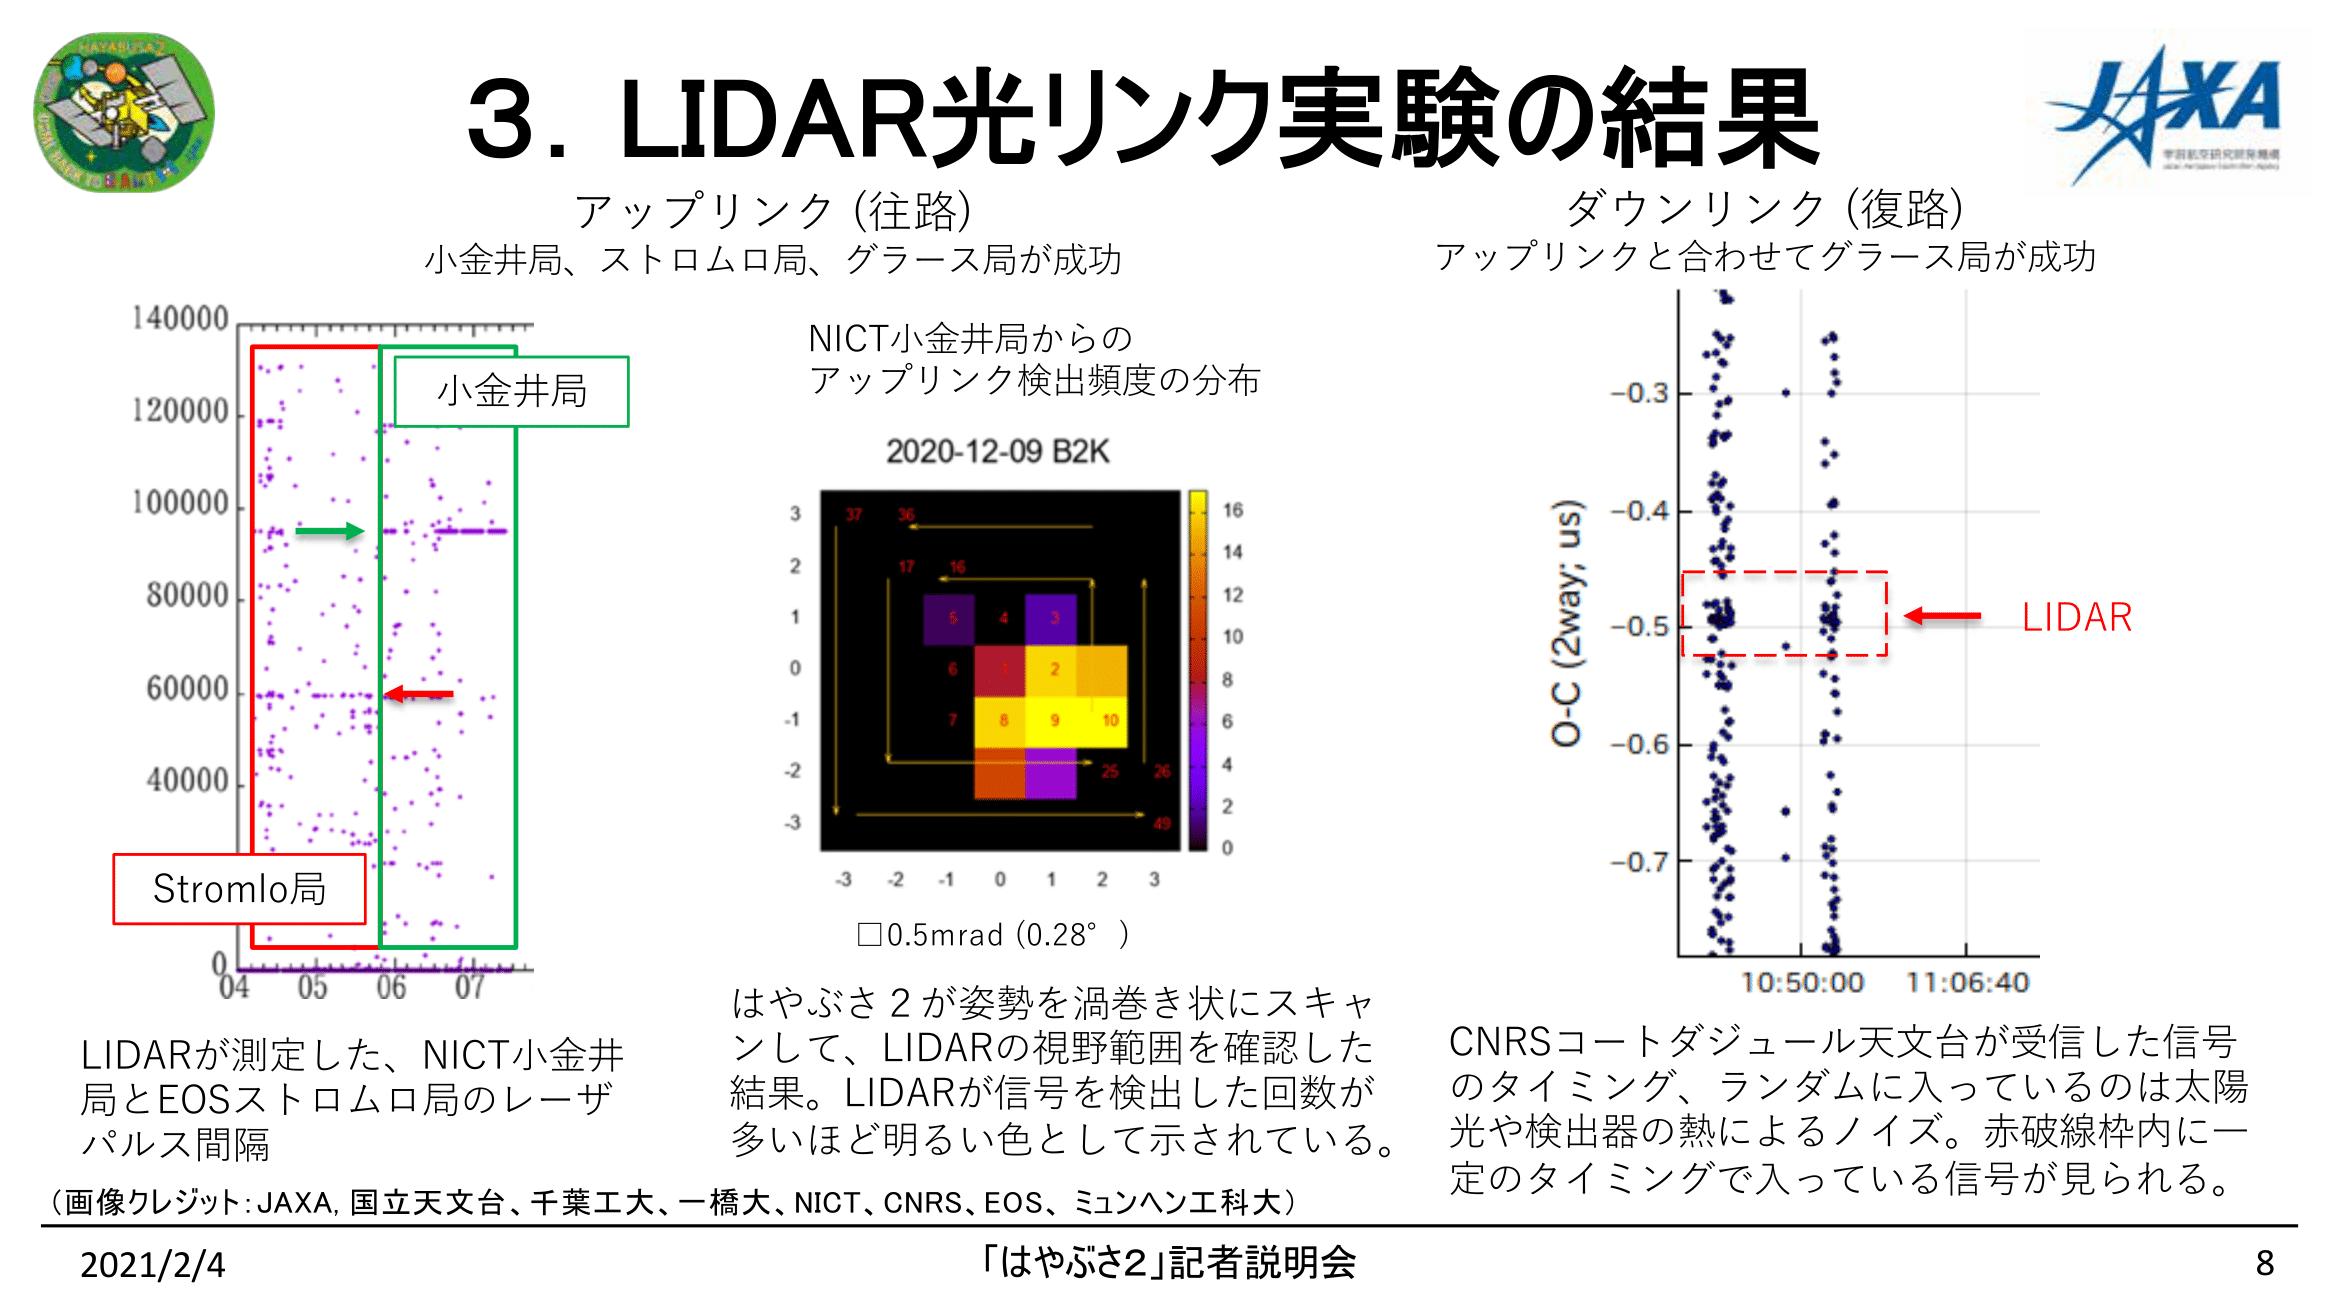 f:id:Imamura:20210204134236p:plain